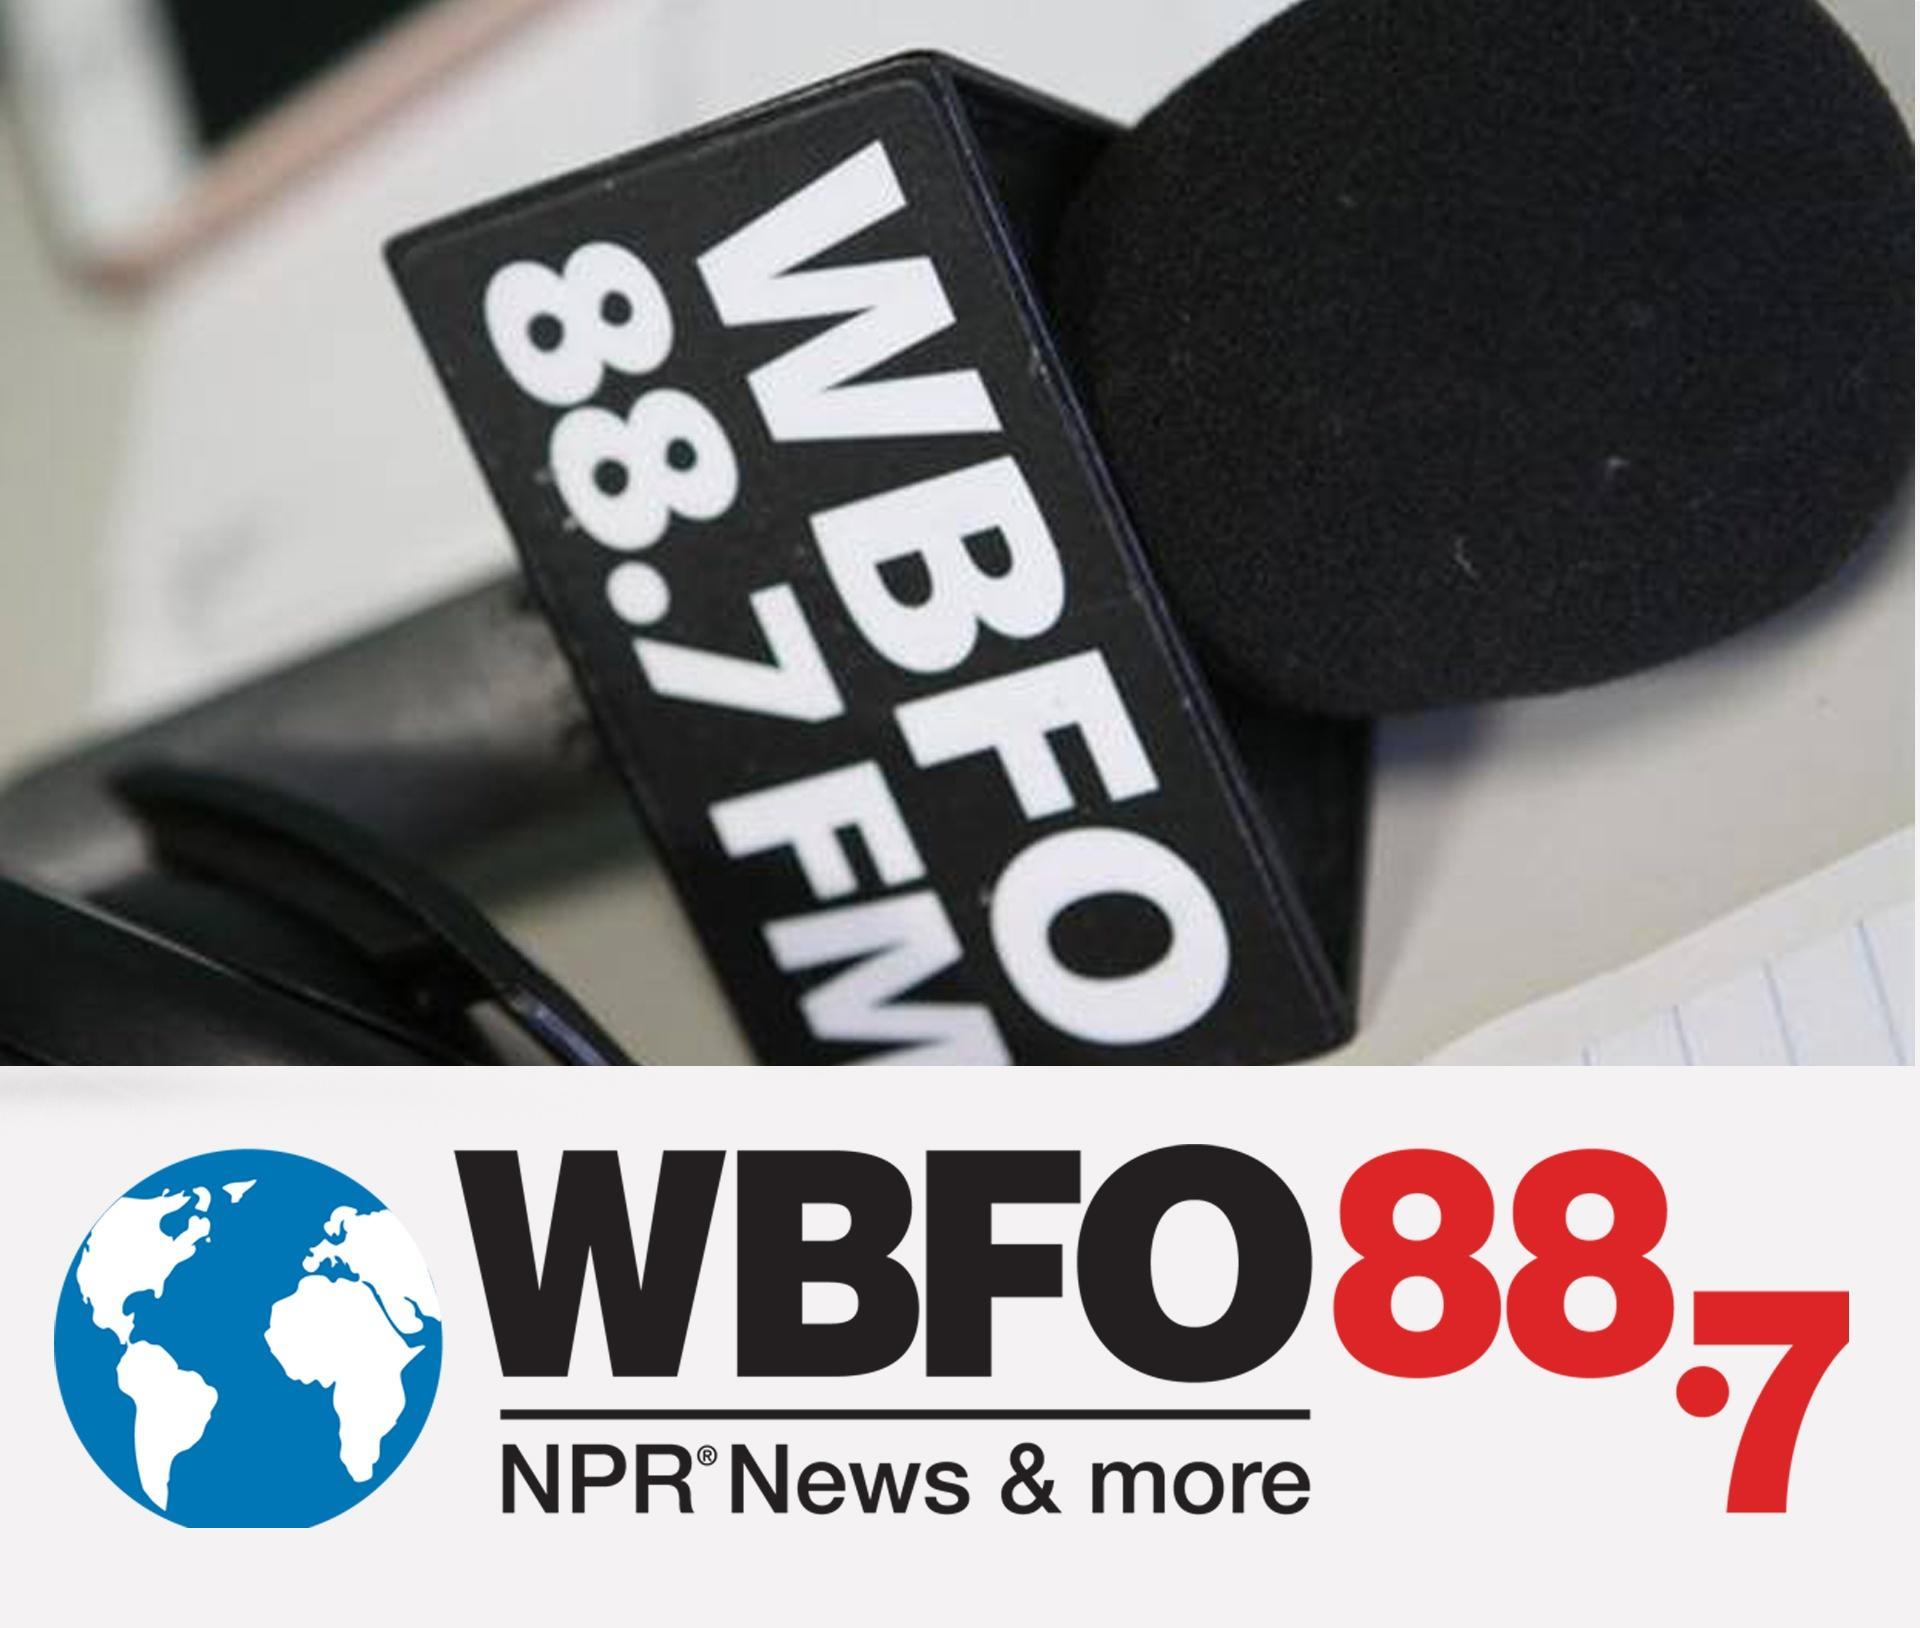 WBFO 88.7 Your NPR Station